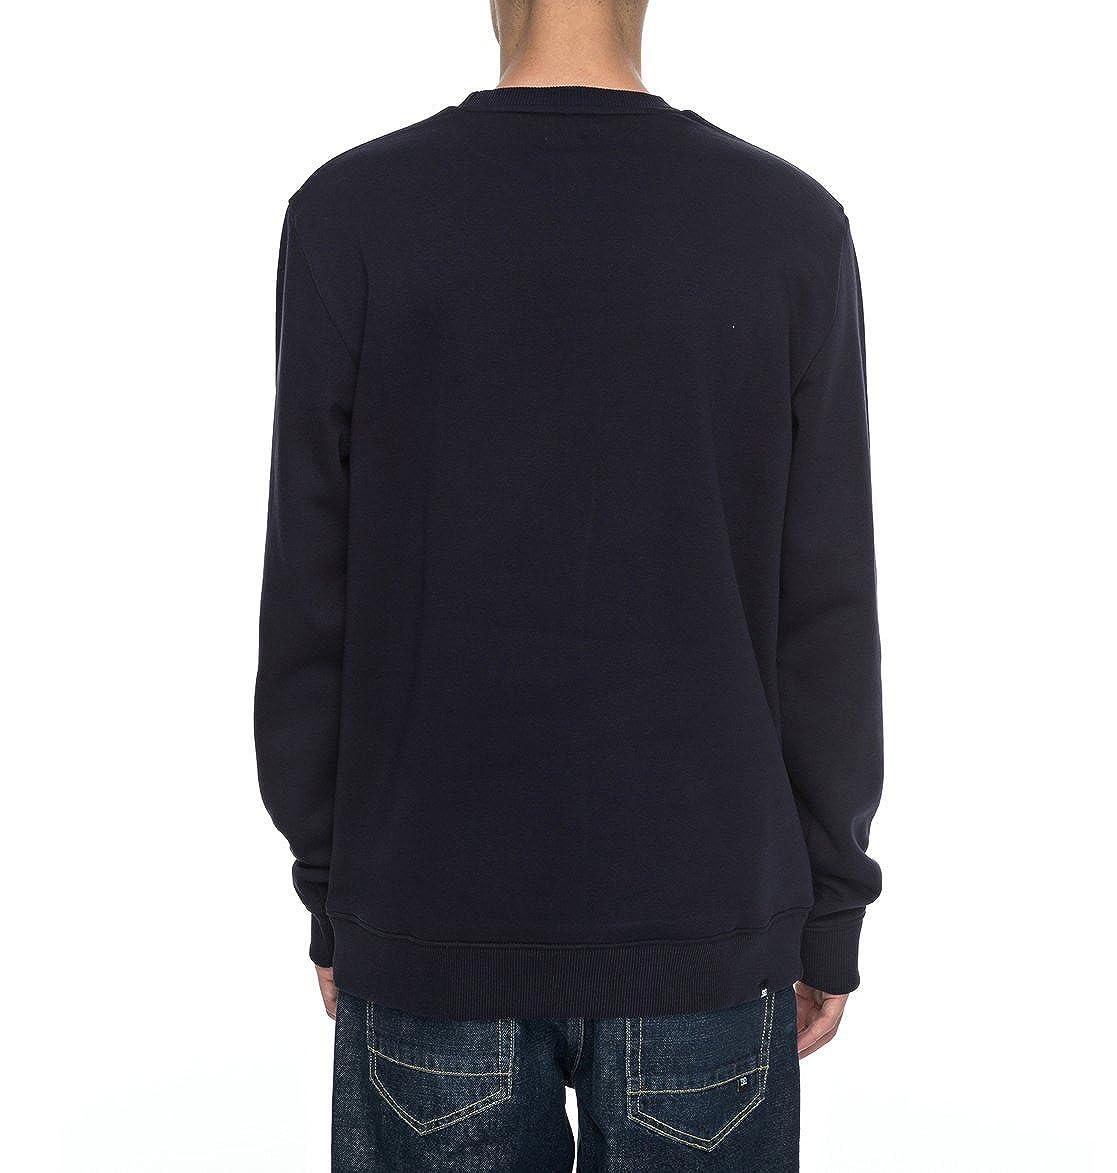 DC Mens Squareside Crew Sweatshirt